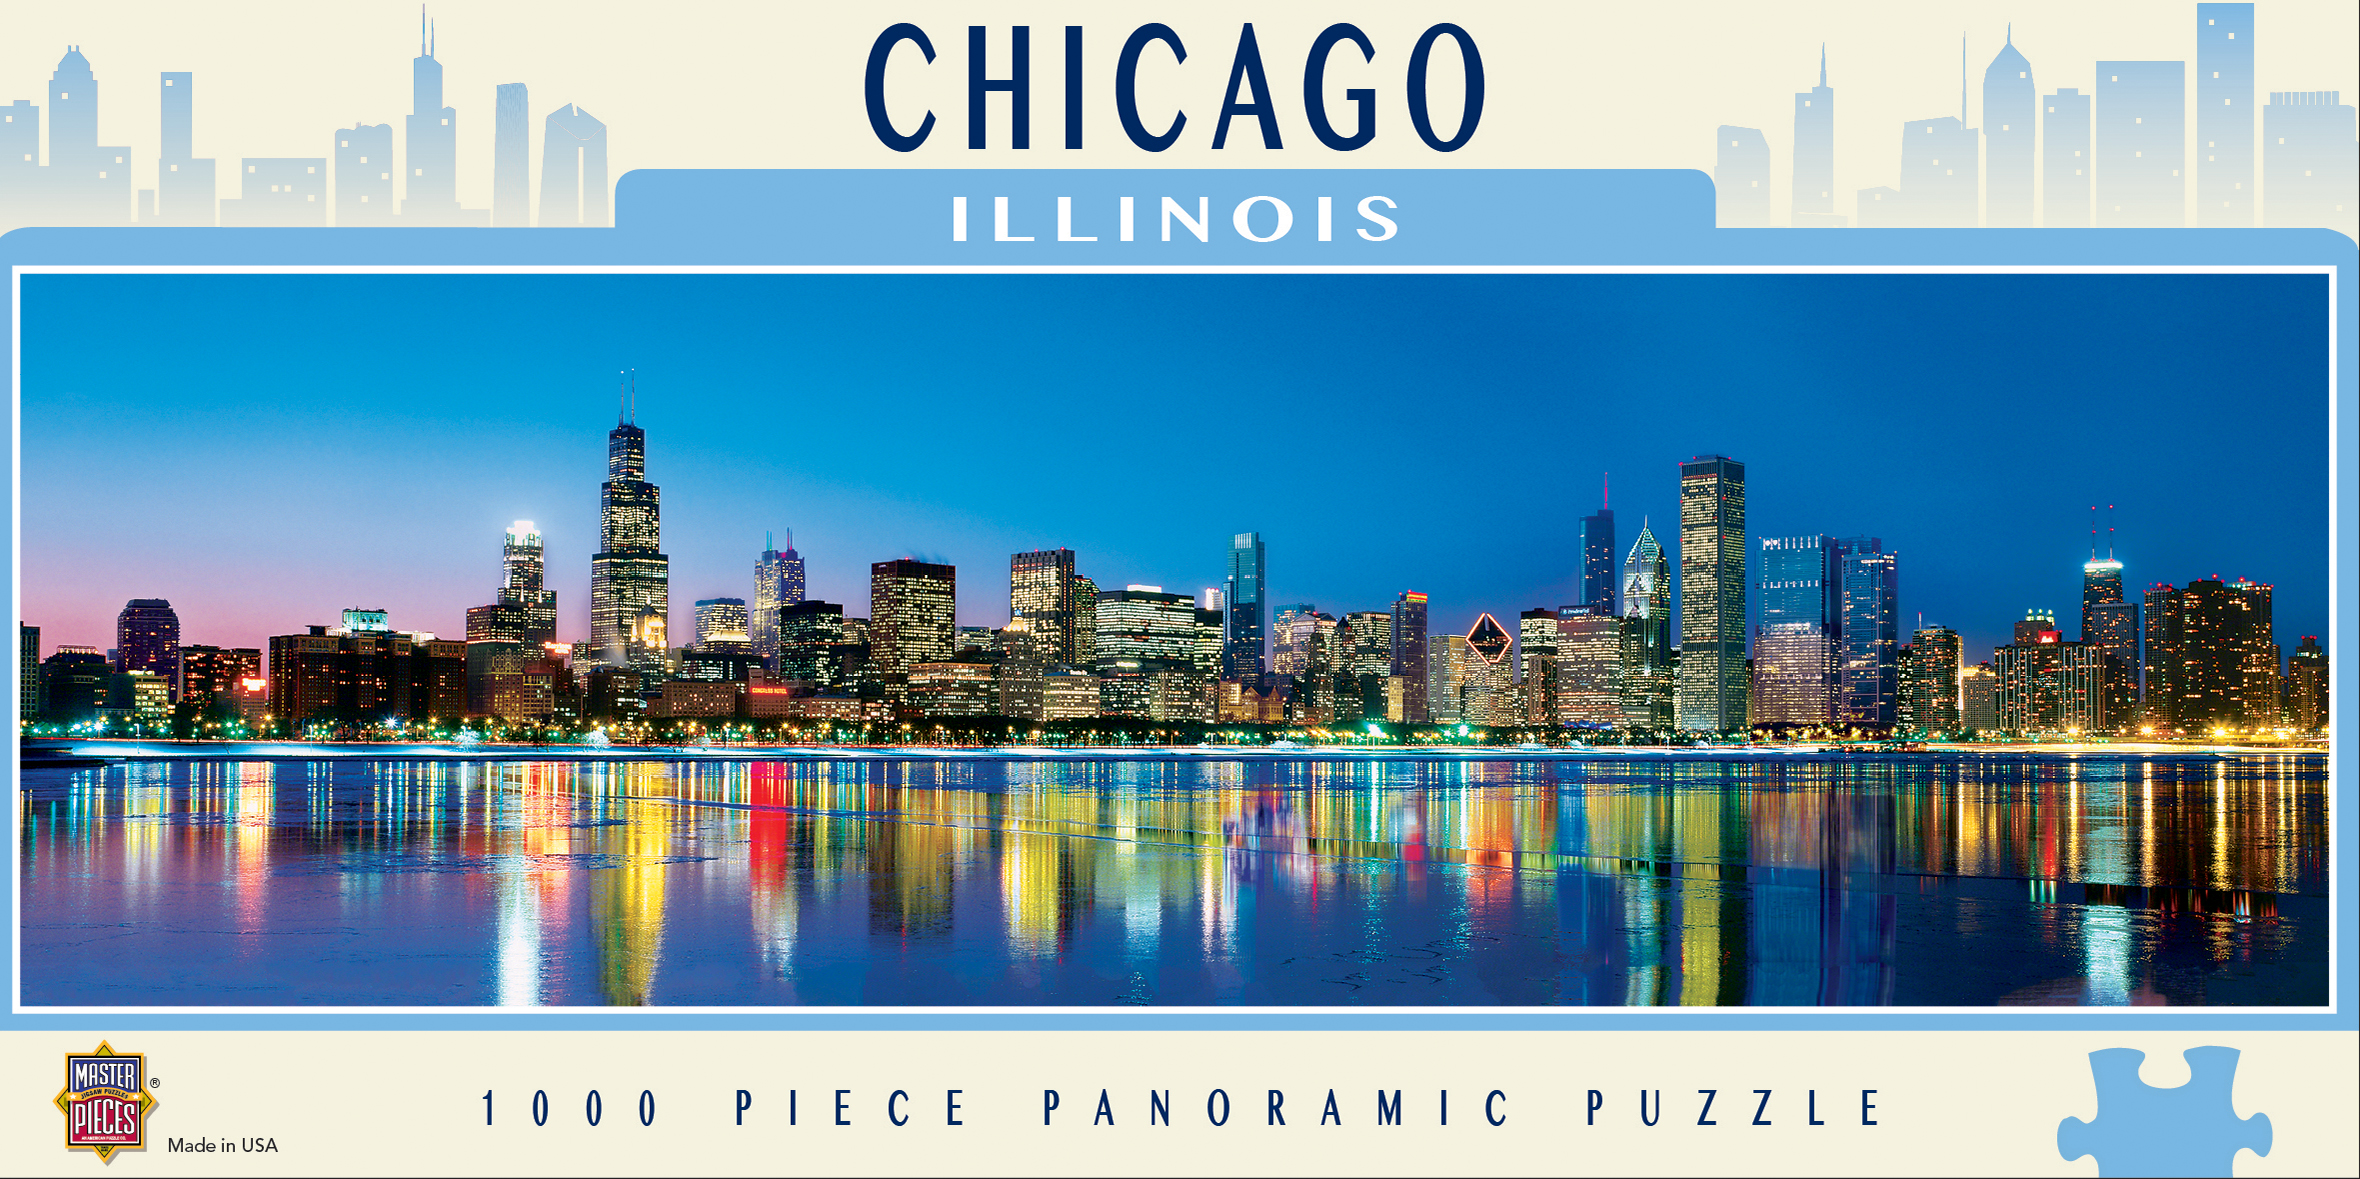 Chicago Skyline / Cityscape Jigsaw Puzzle